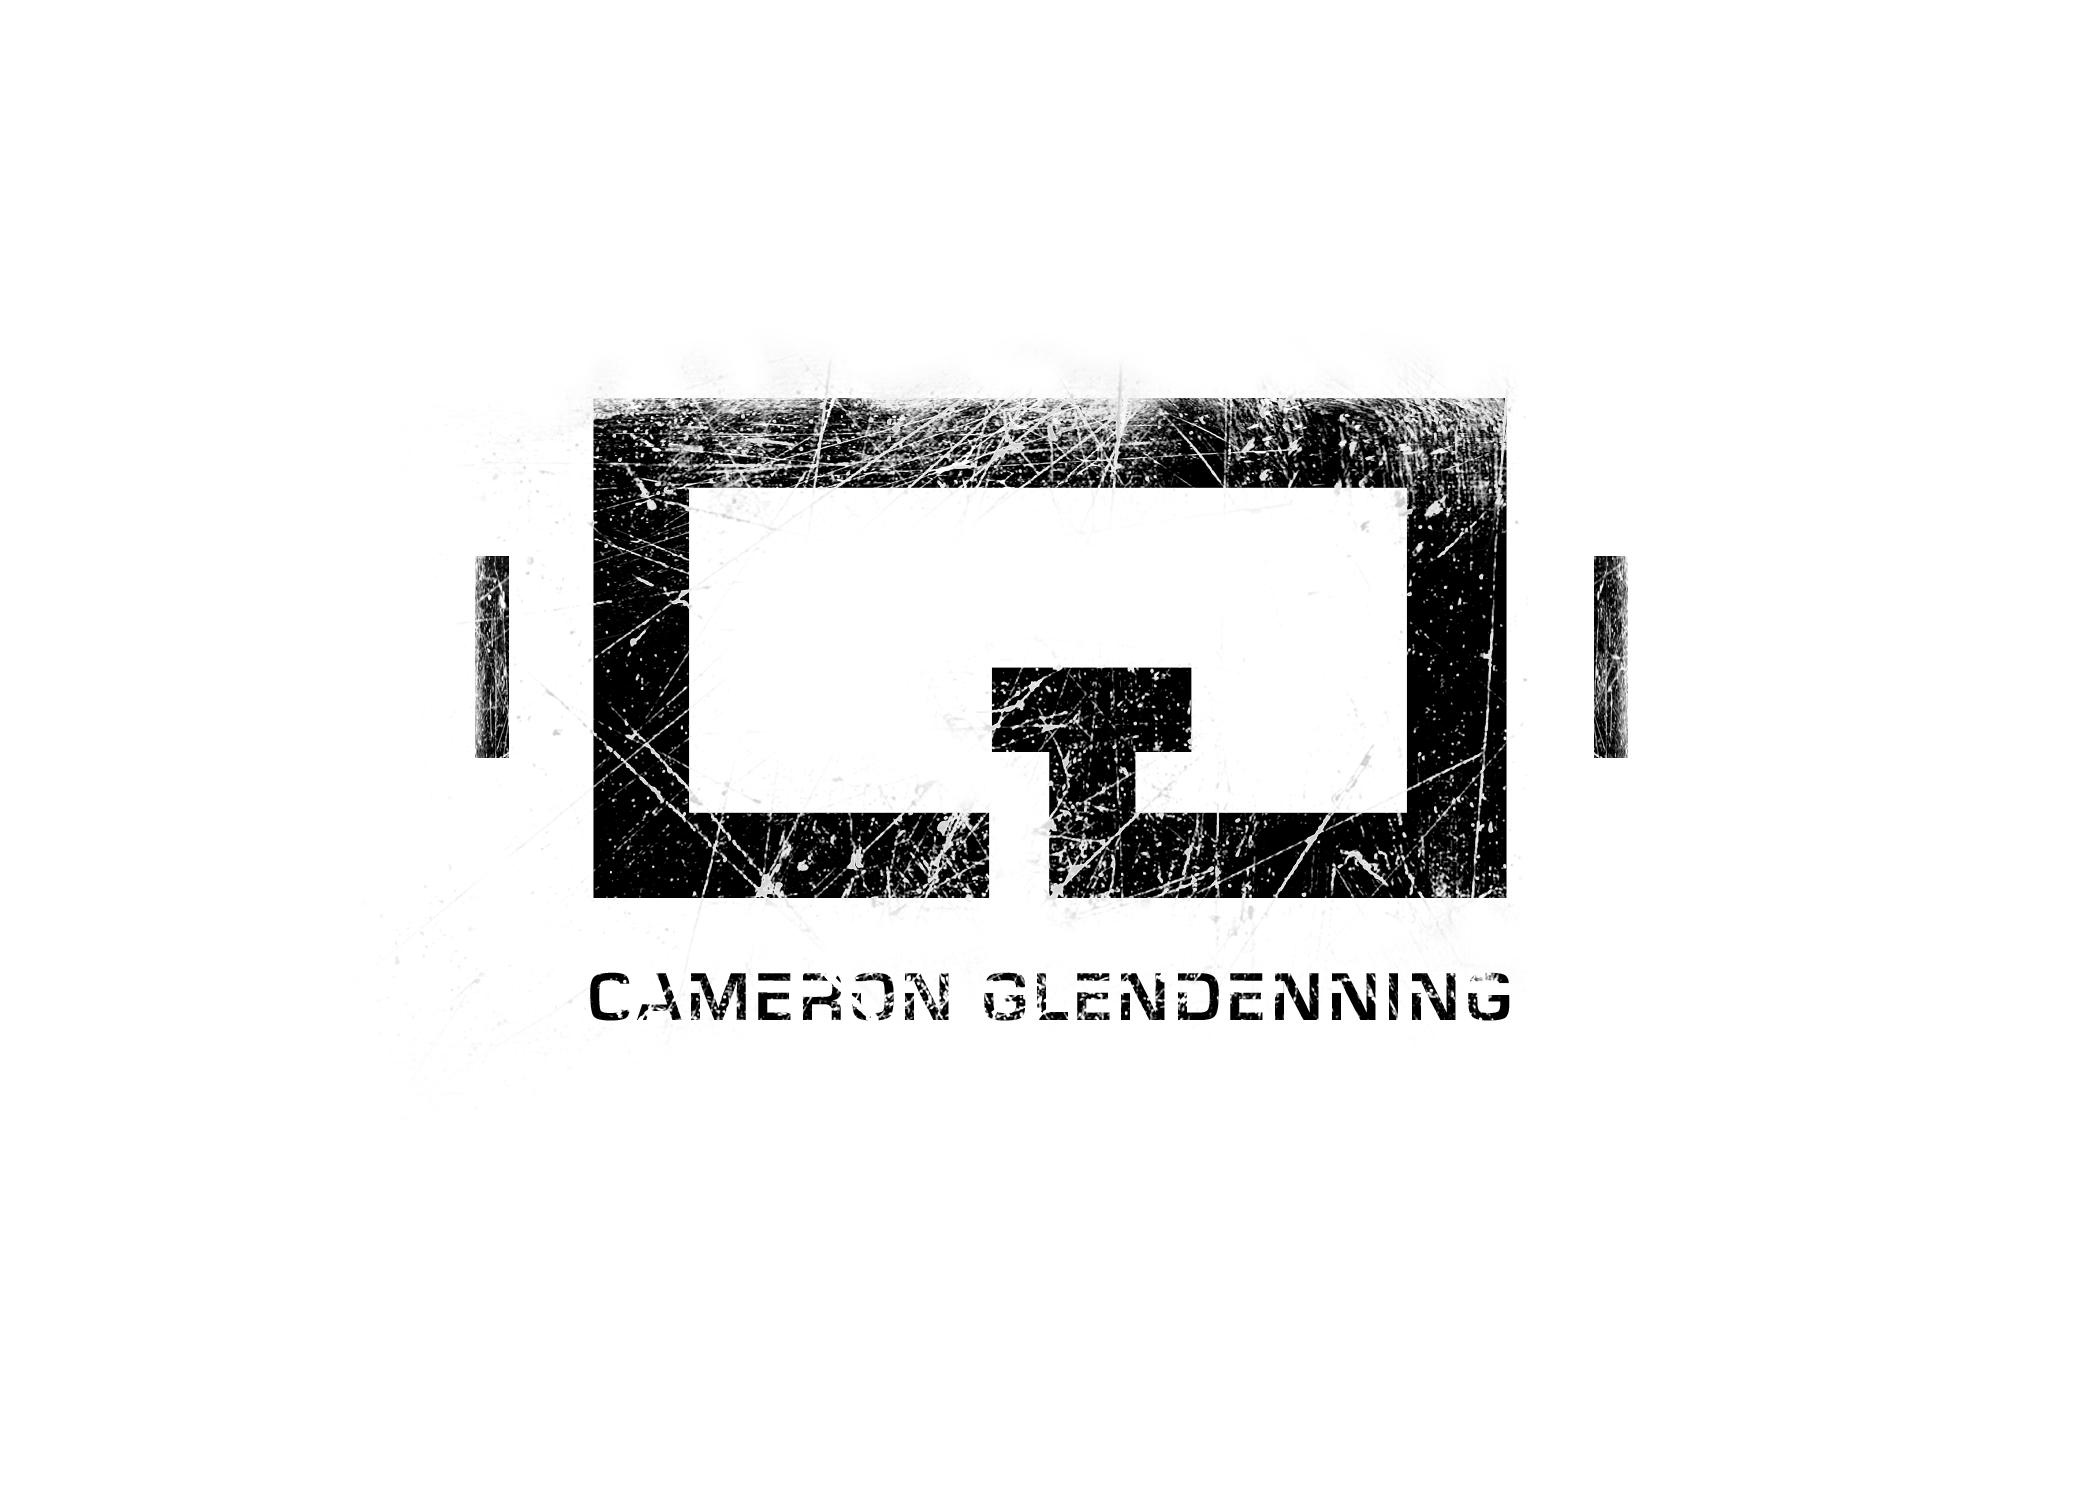 Cameron Glendenning - Cameron Glendenning